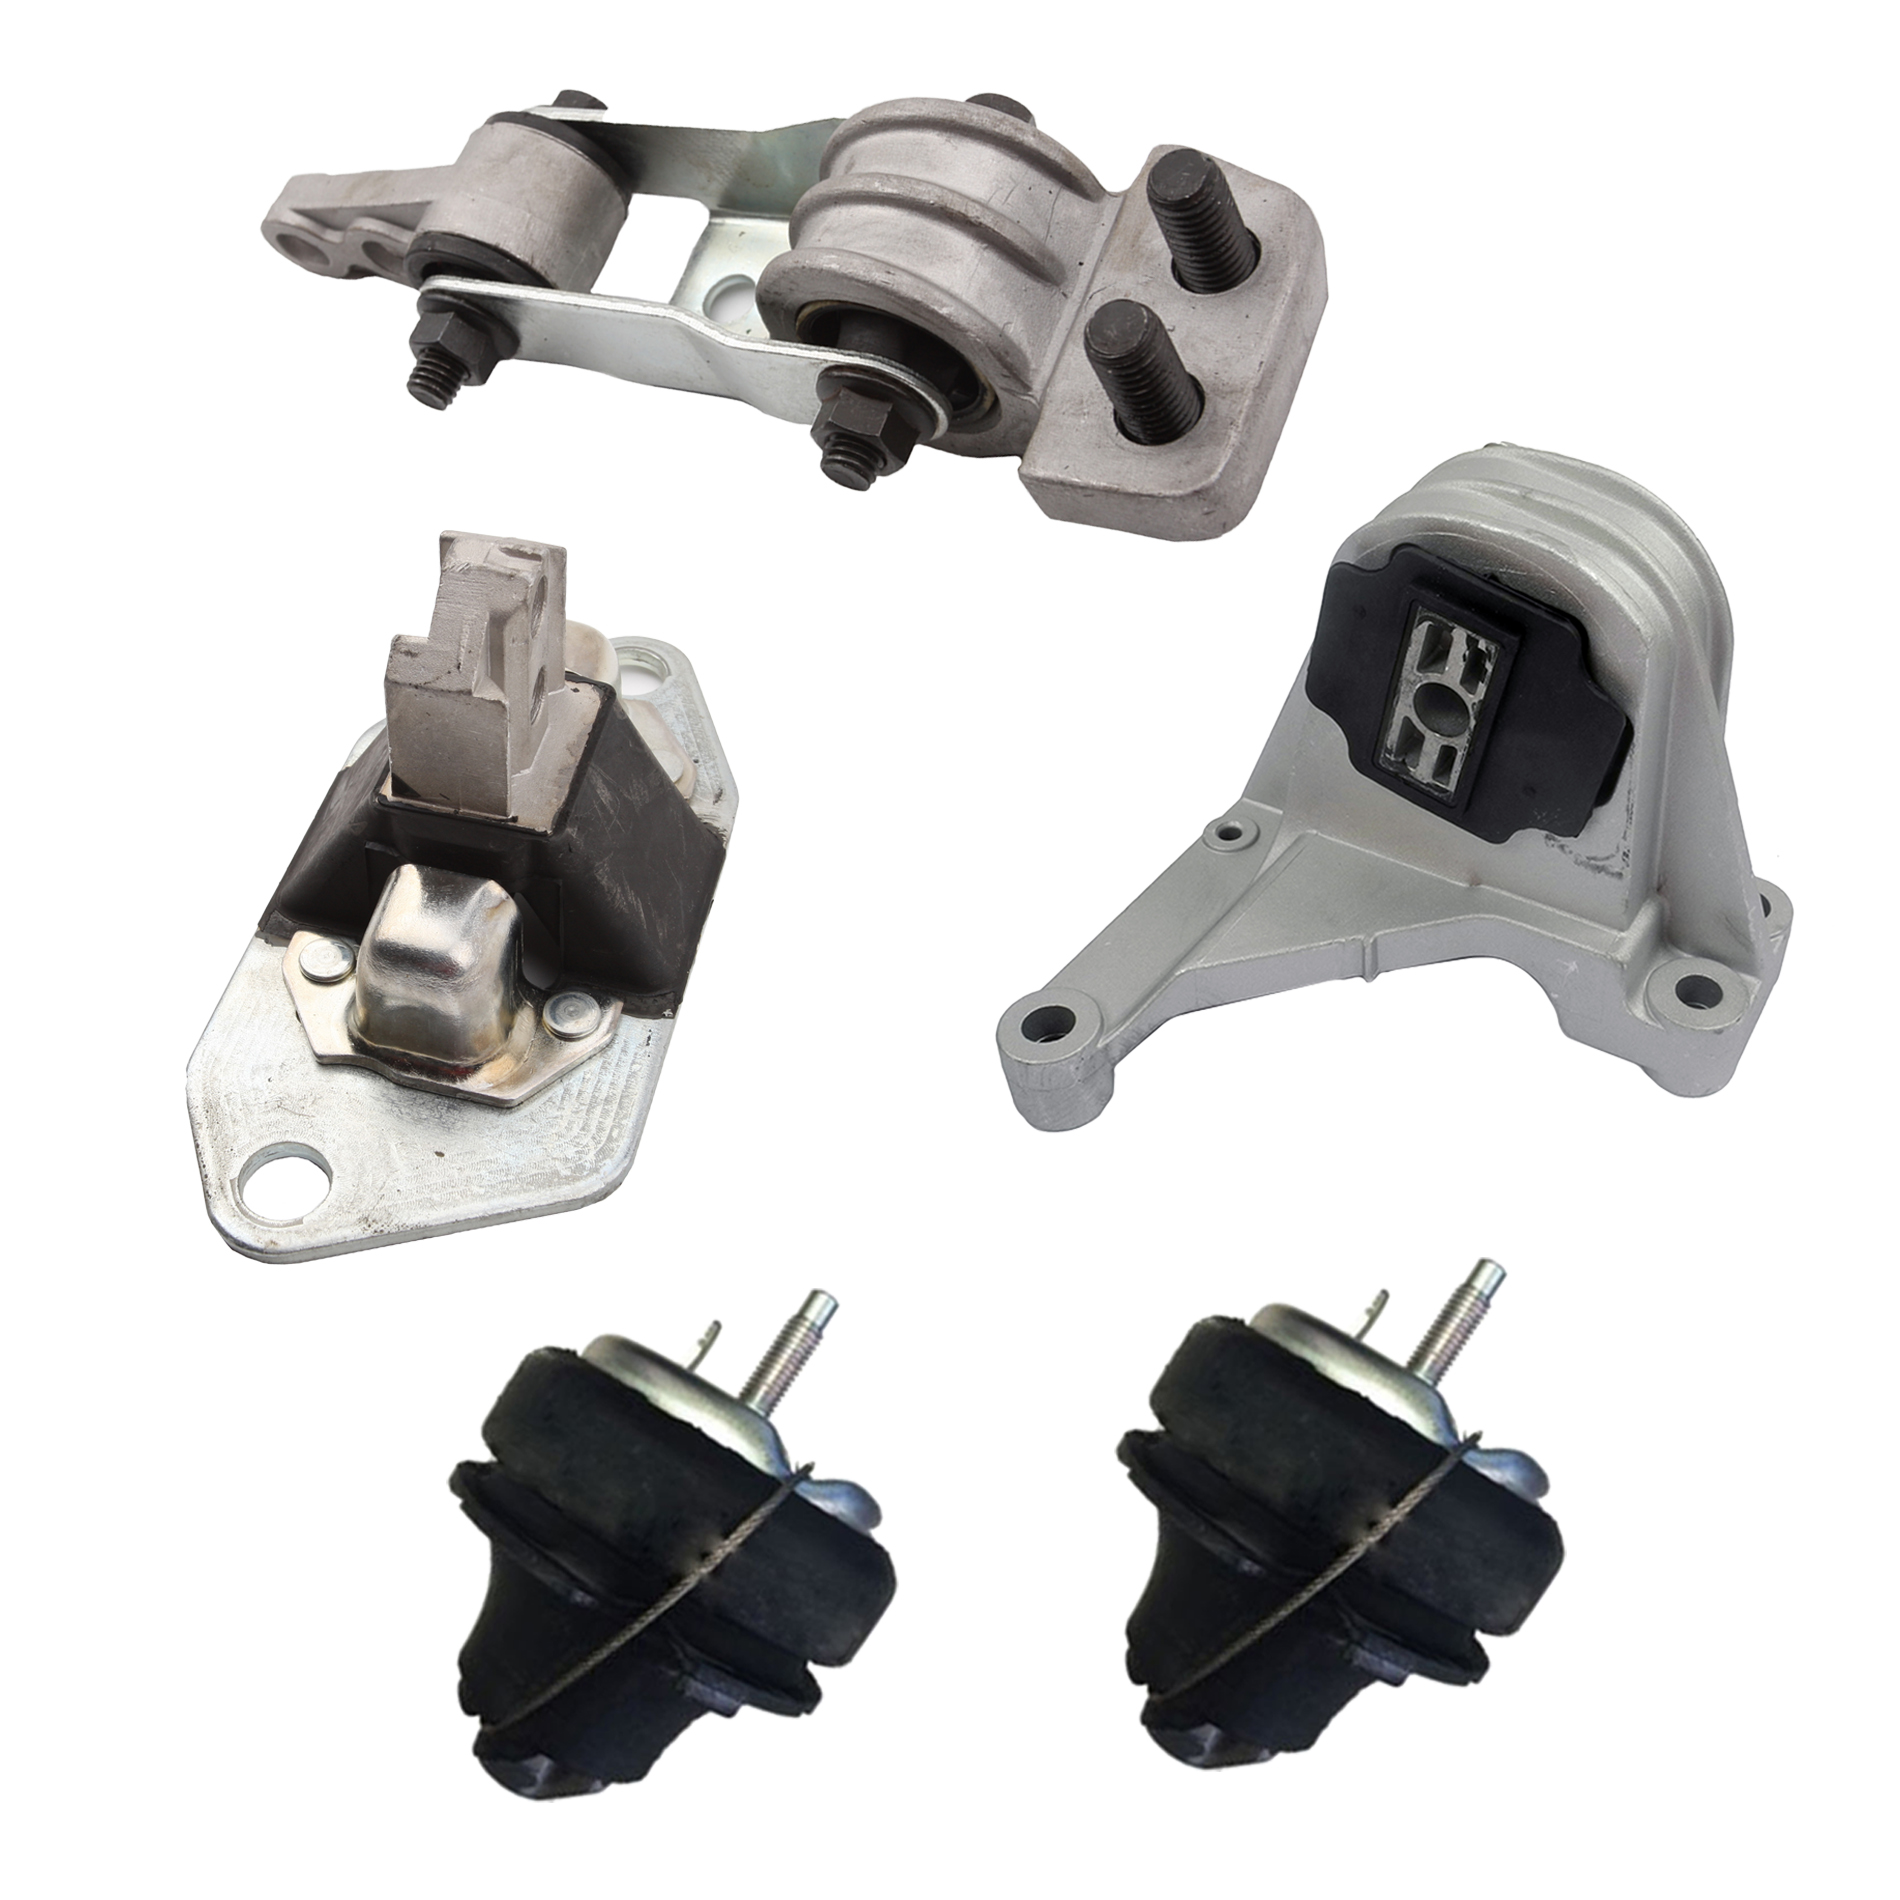 2.5L 2.4L New 5 PCS Engine Motor Mount Set Kit For 01-07 Volvo V70 XC90 2.3L